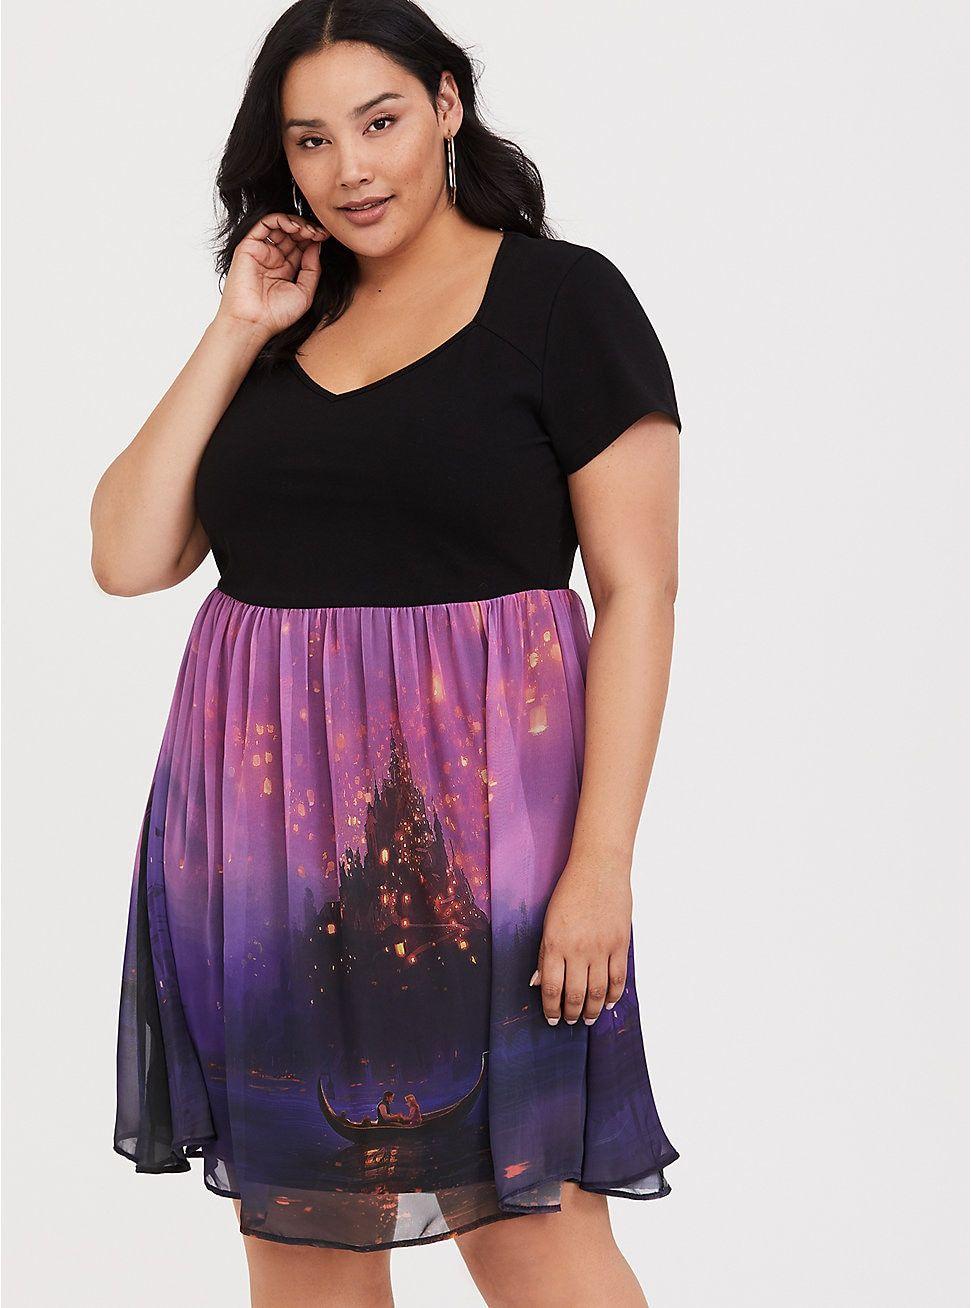 Disney Tangled Lantern Dress   Plus size dresses, Disney ...